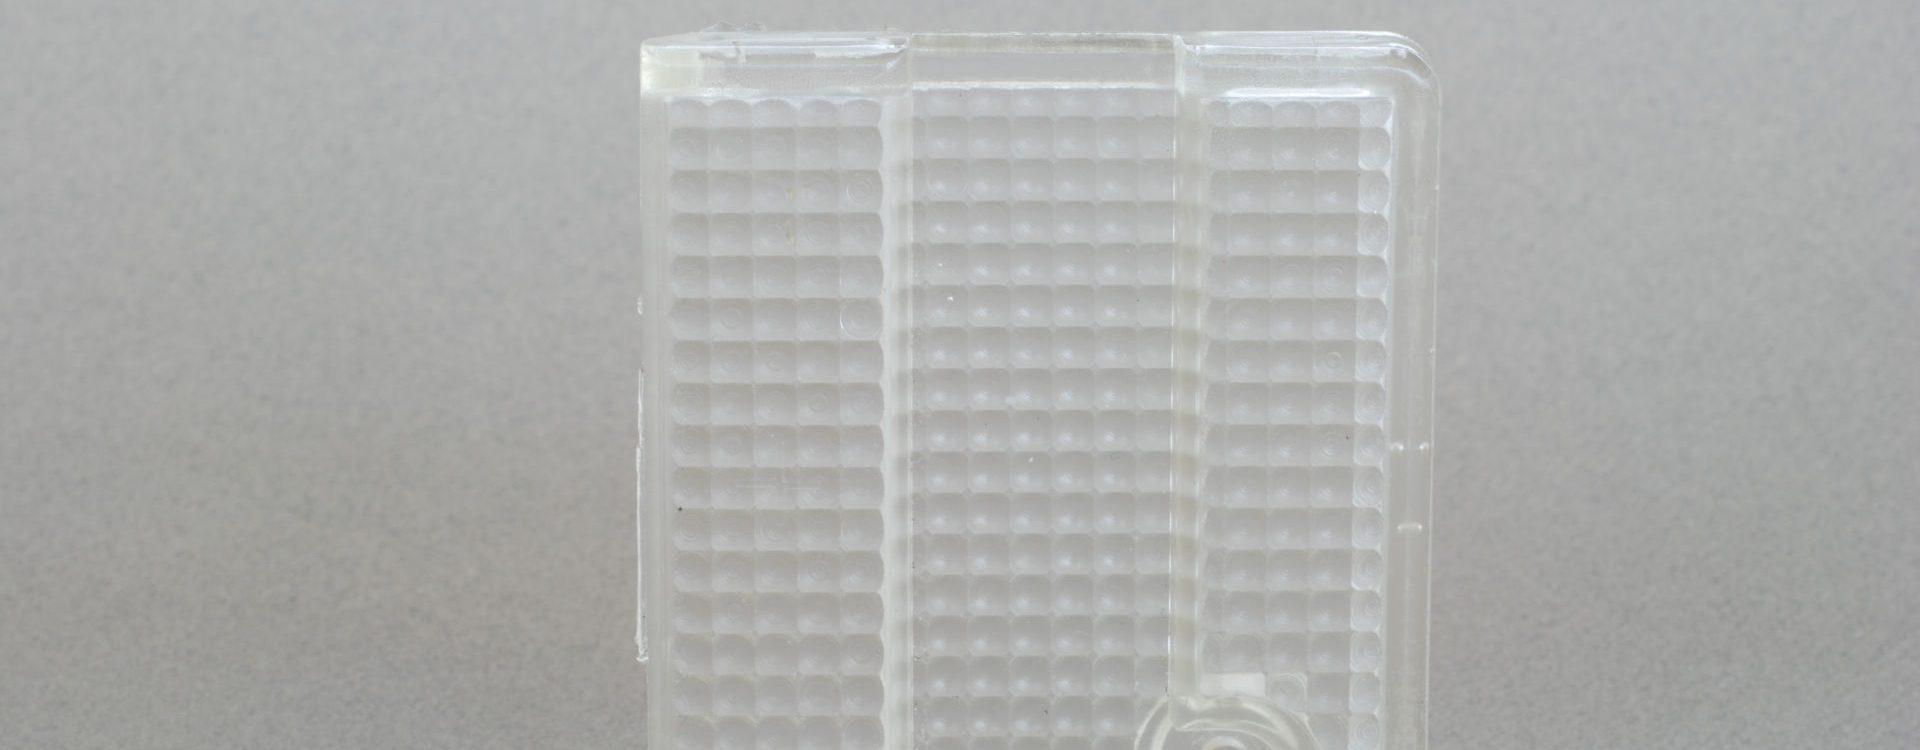 Vakuumguss mit transparenten Materialien